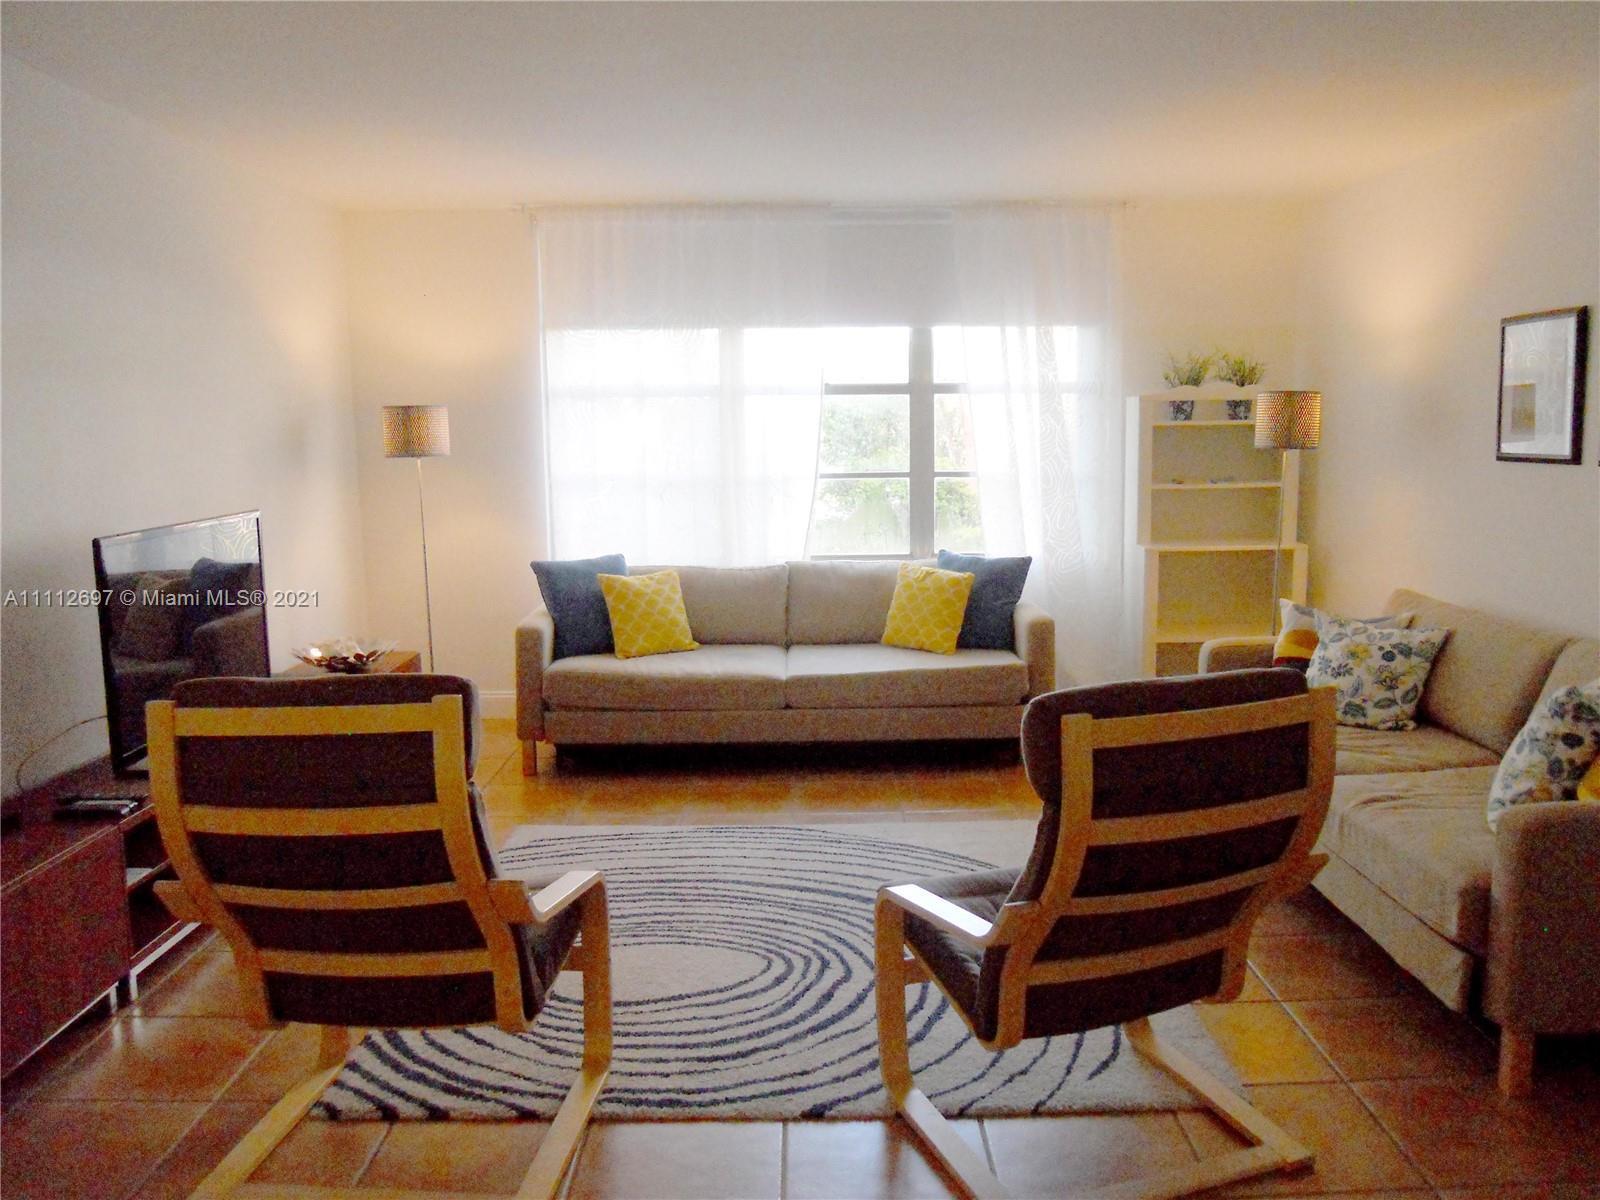 Spacious one bedroom - 1.5 baths in resort living oceanfront Seacoast 5151 Condominium; Great invest